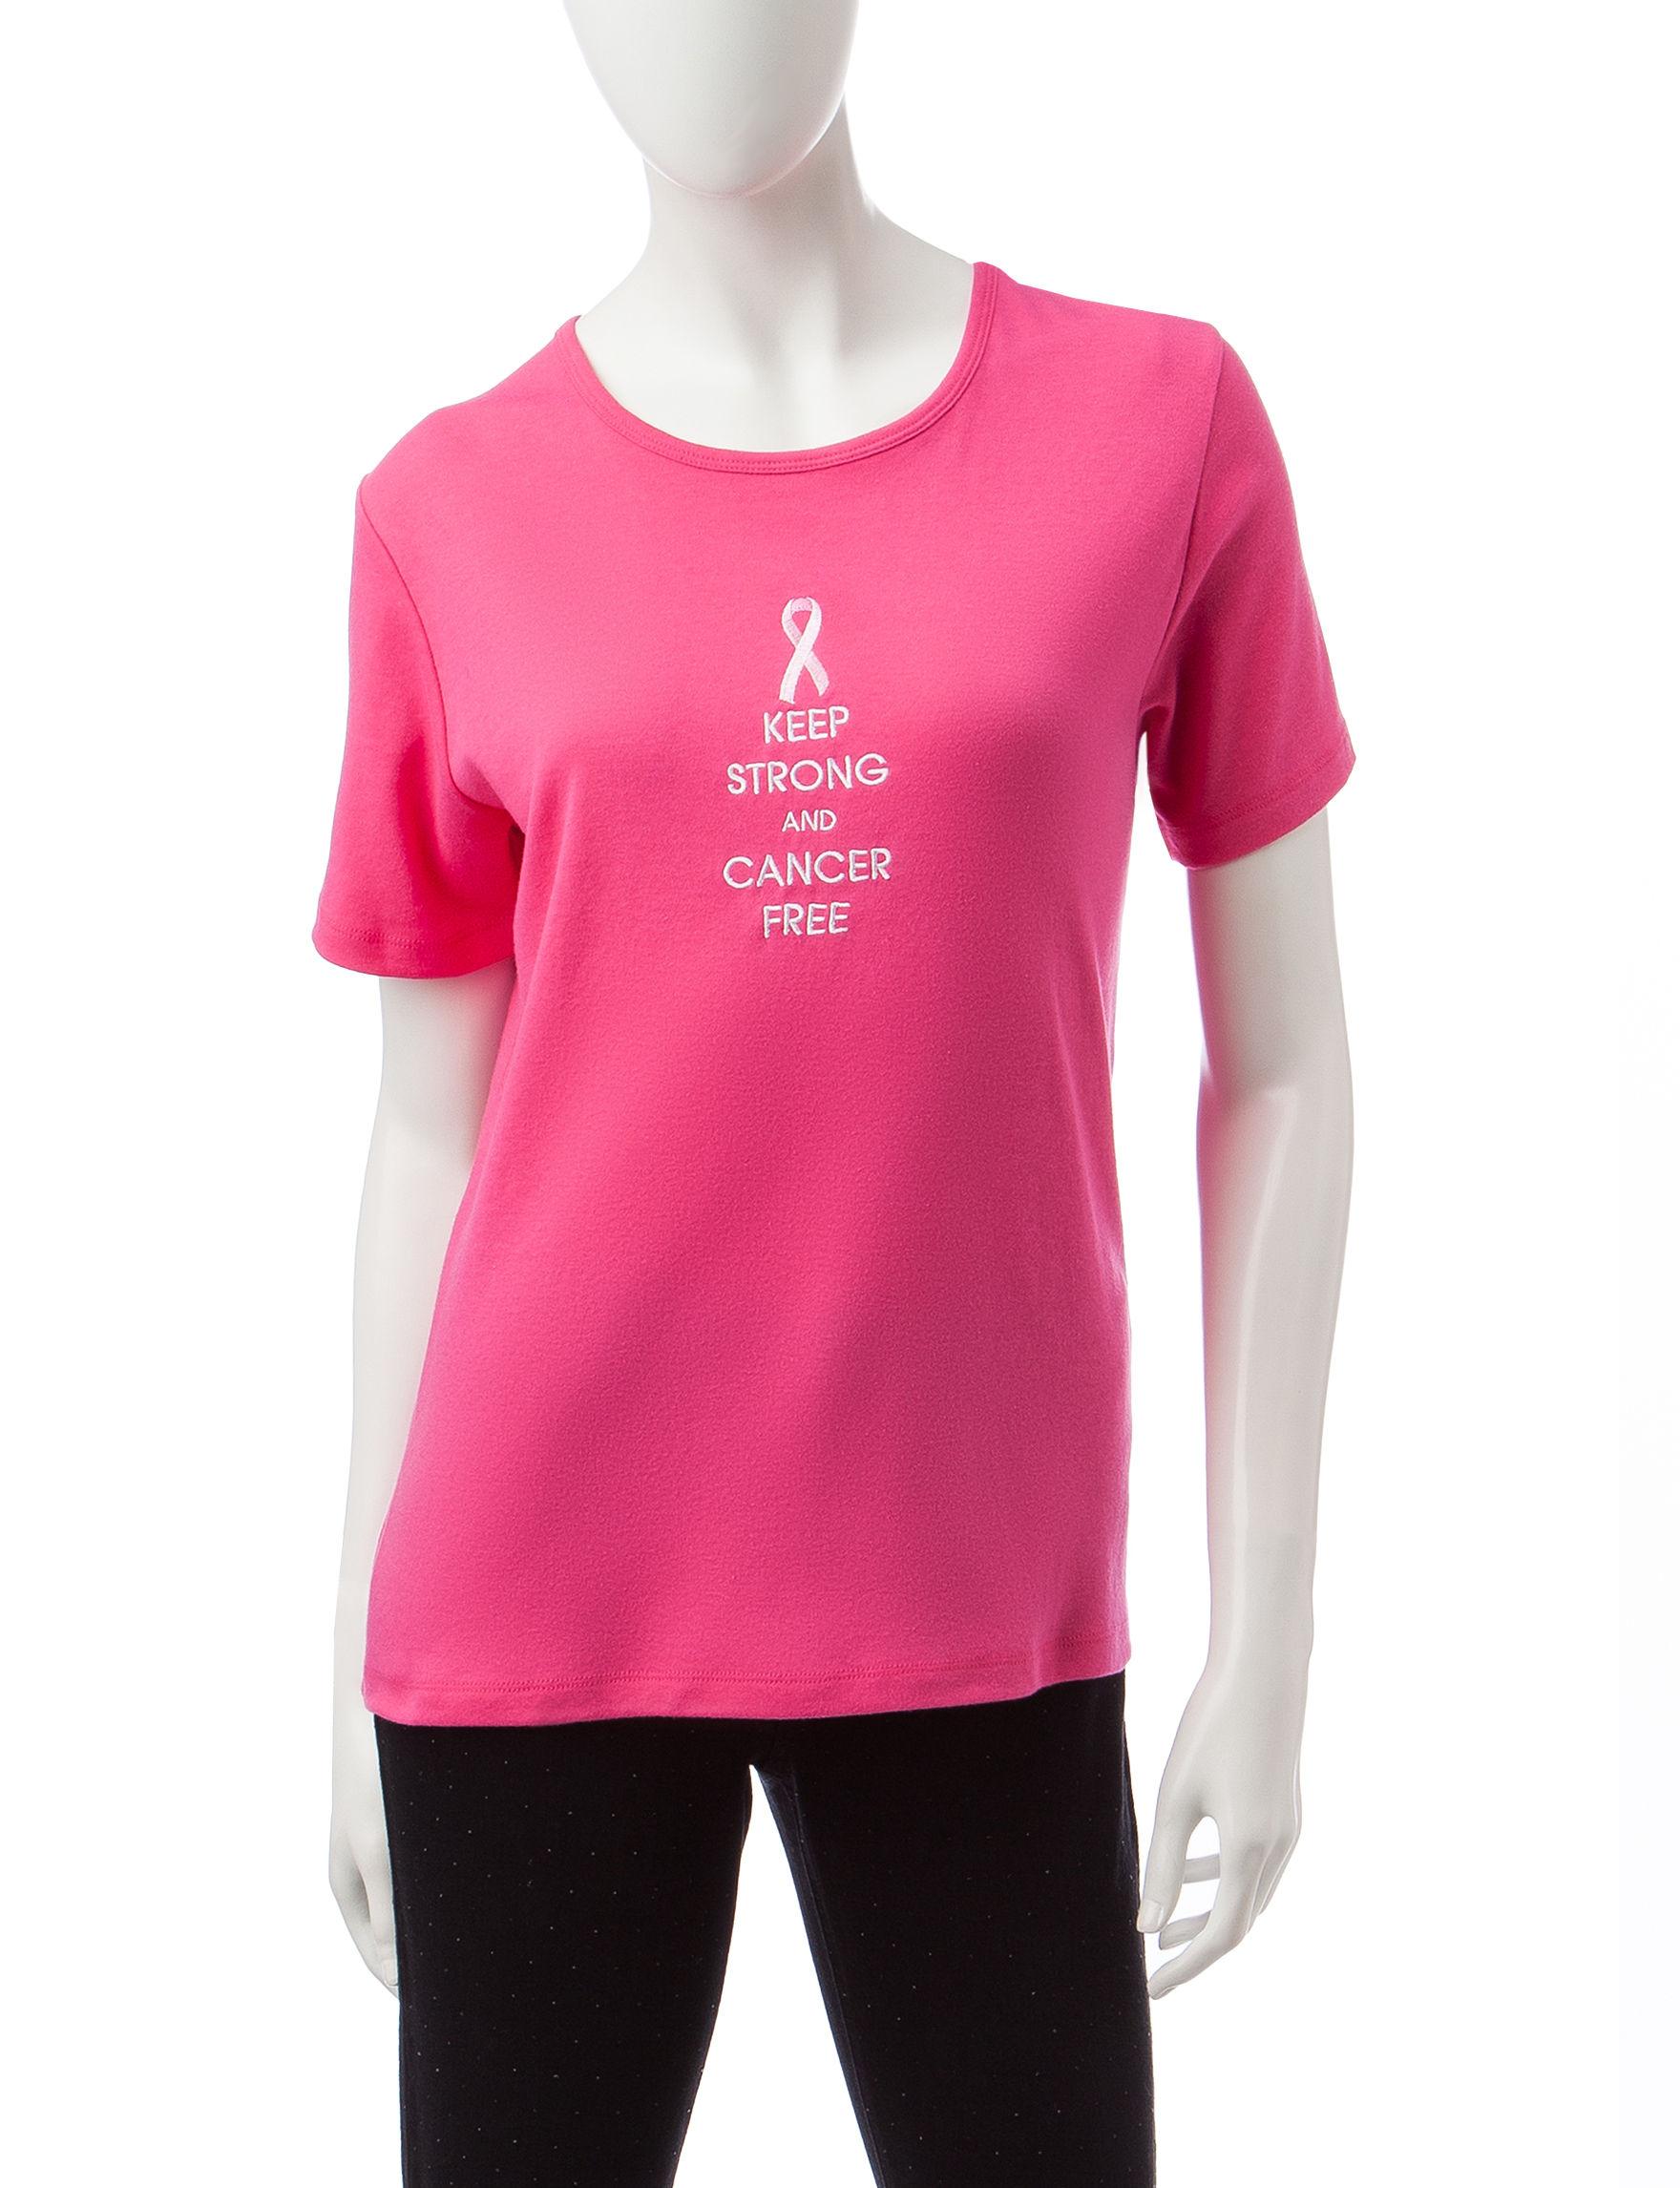 MCcc Sportswear Hot Pink Shirts & Blouses